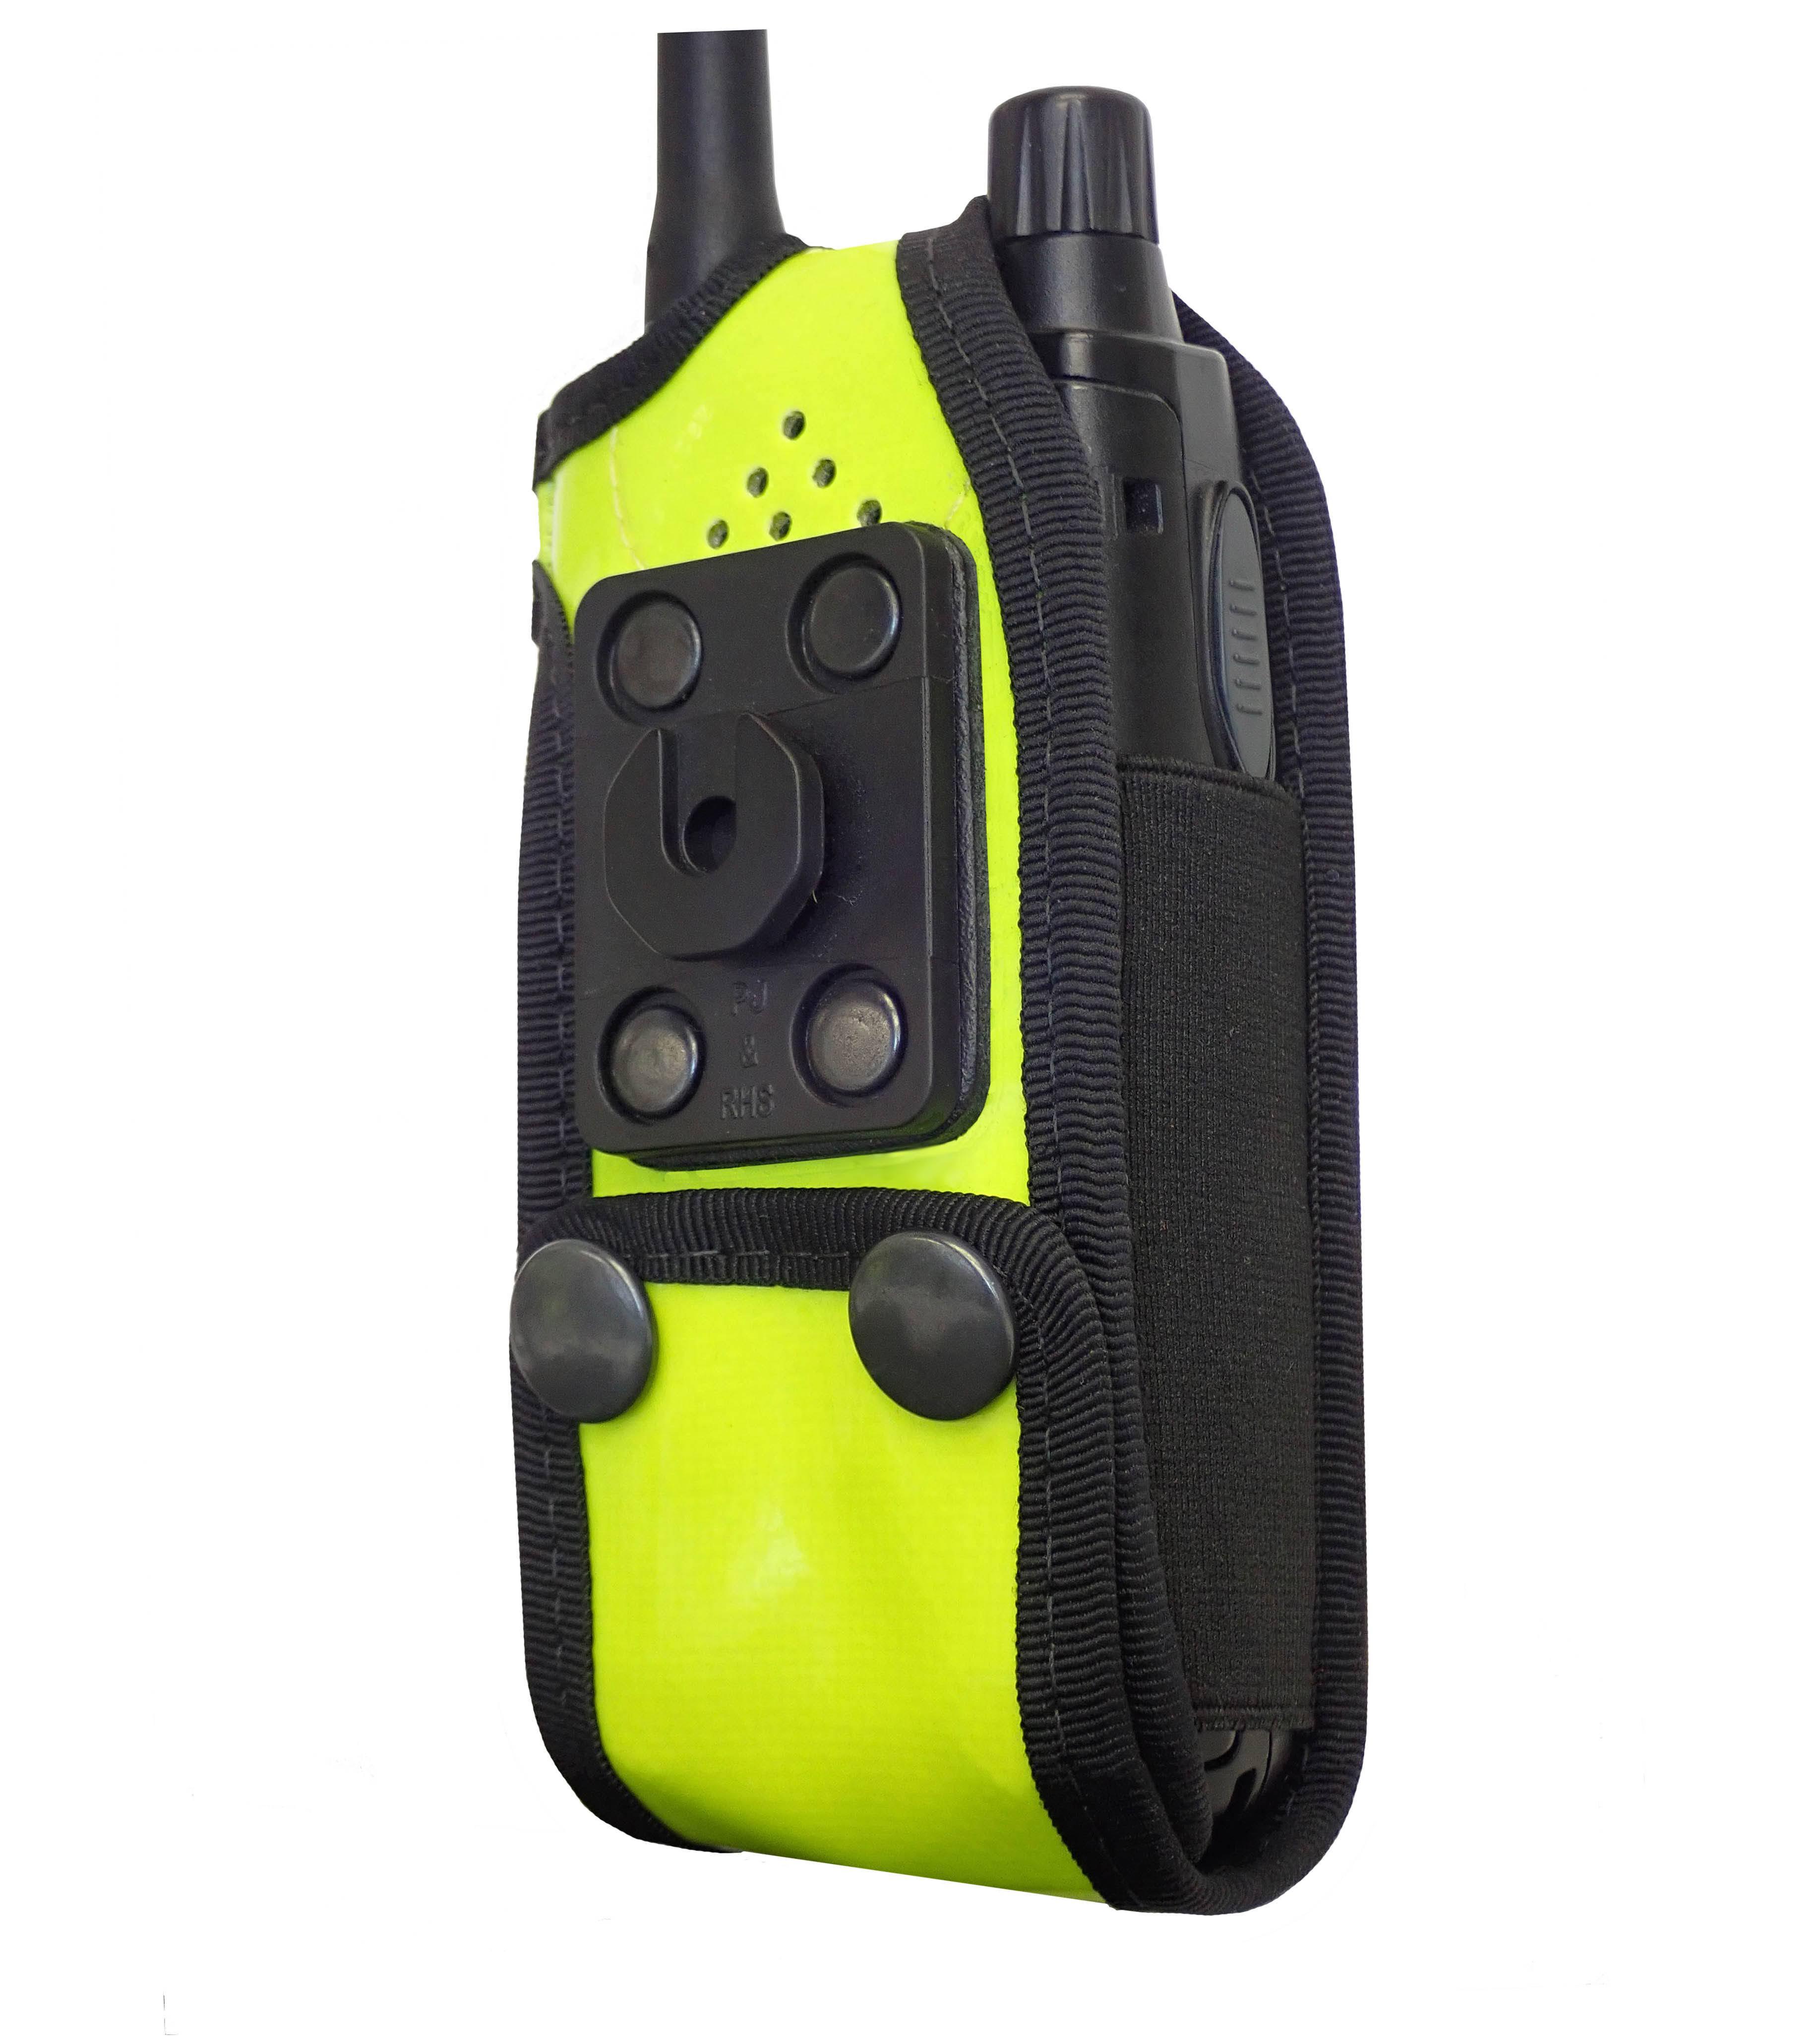 Sepura SRP2000 Tetra Hi-Vis Yellow PU radio case with Click-On